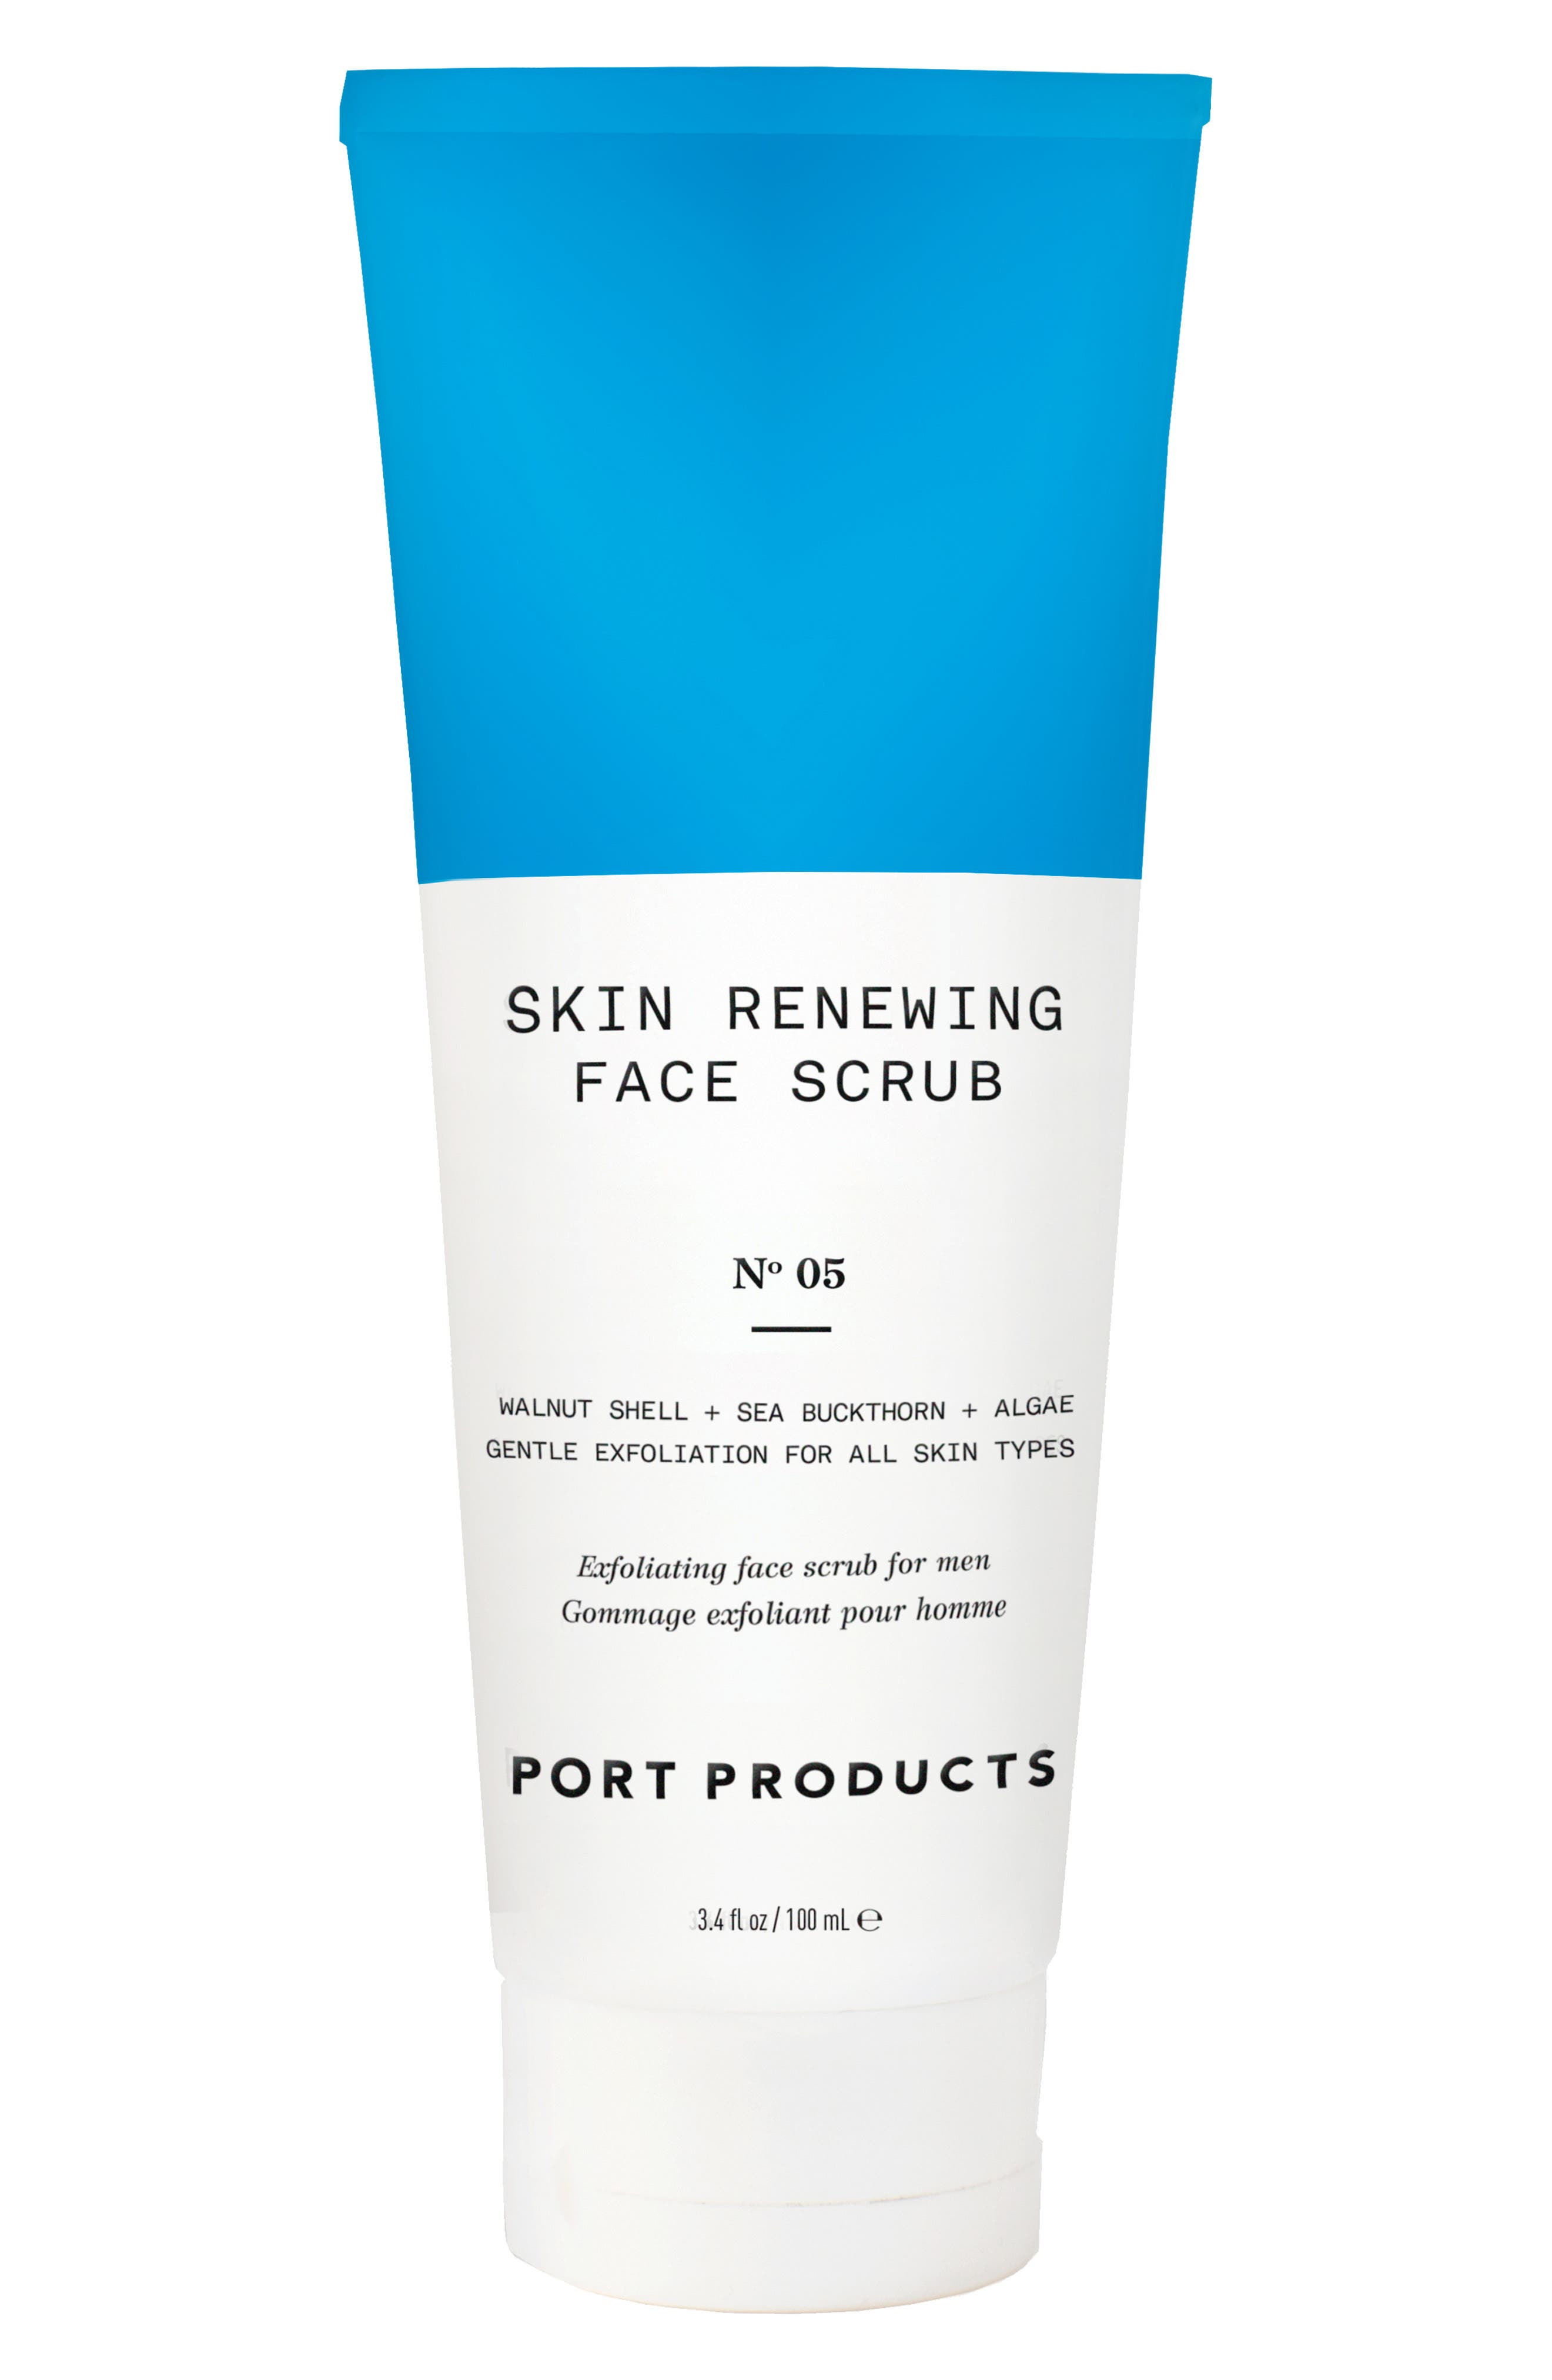 PORT PRODUCTS Skin Renewing Face Scrub